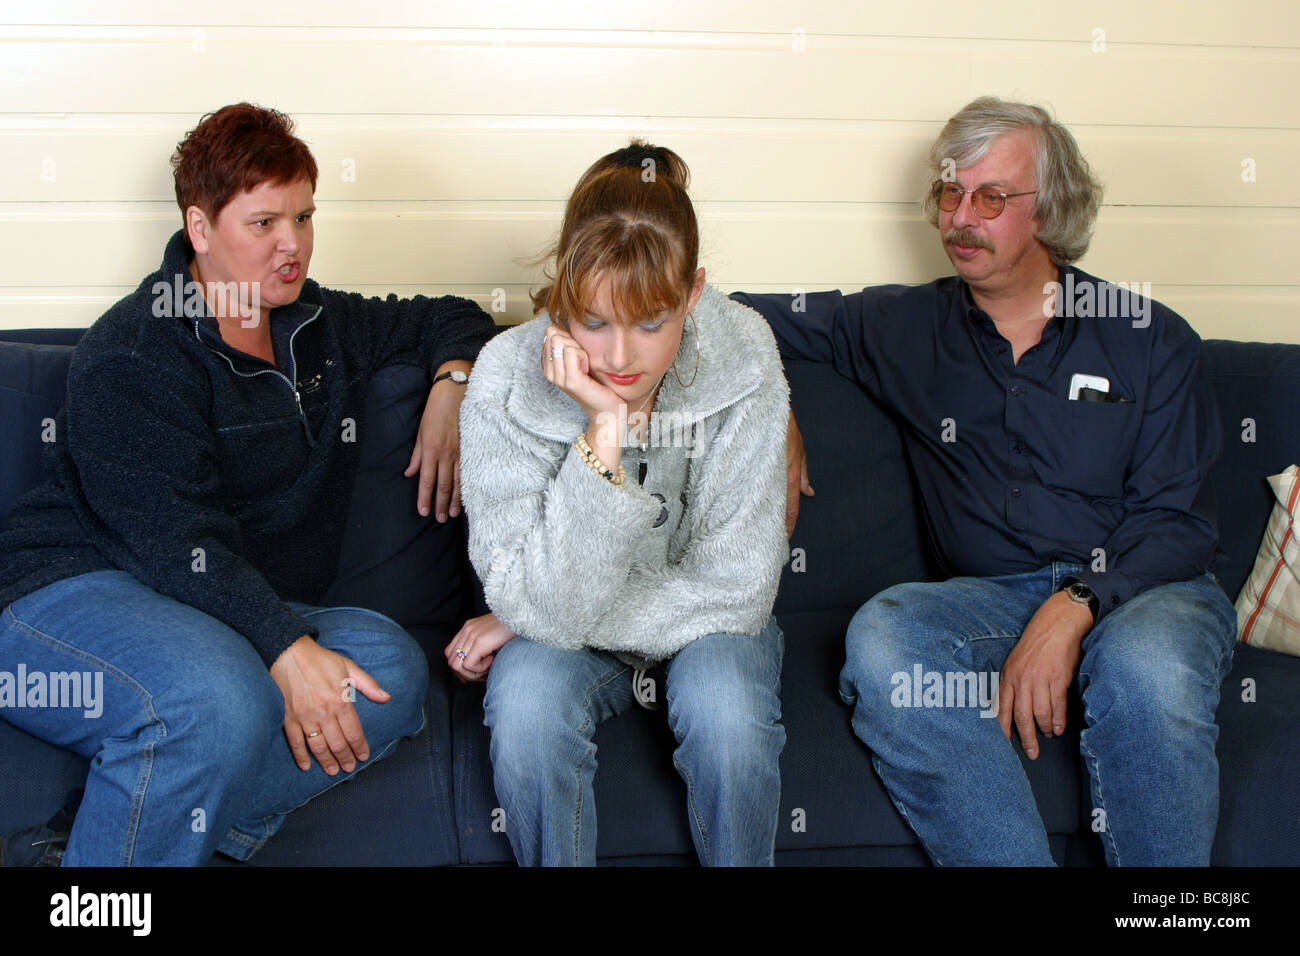 Teen years : Defiant teenage girl sit on the sofa between